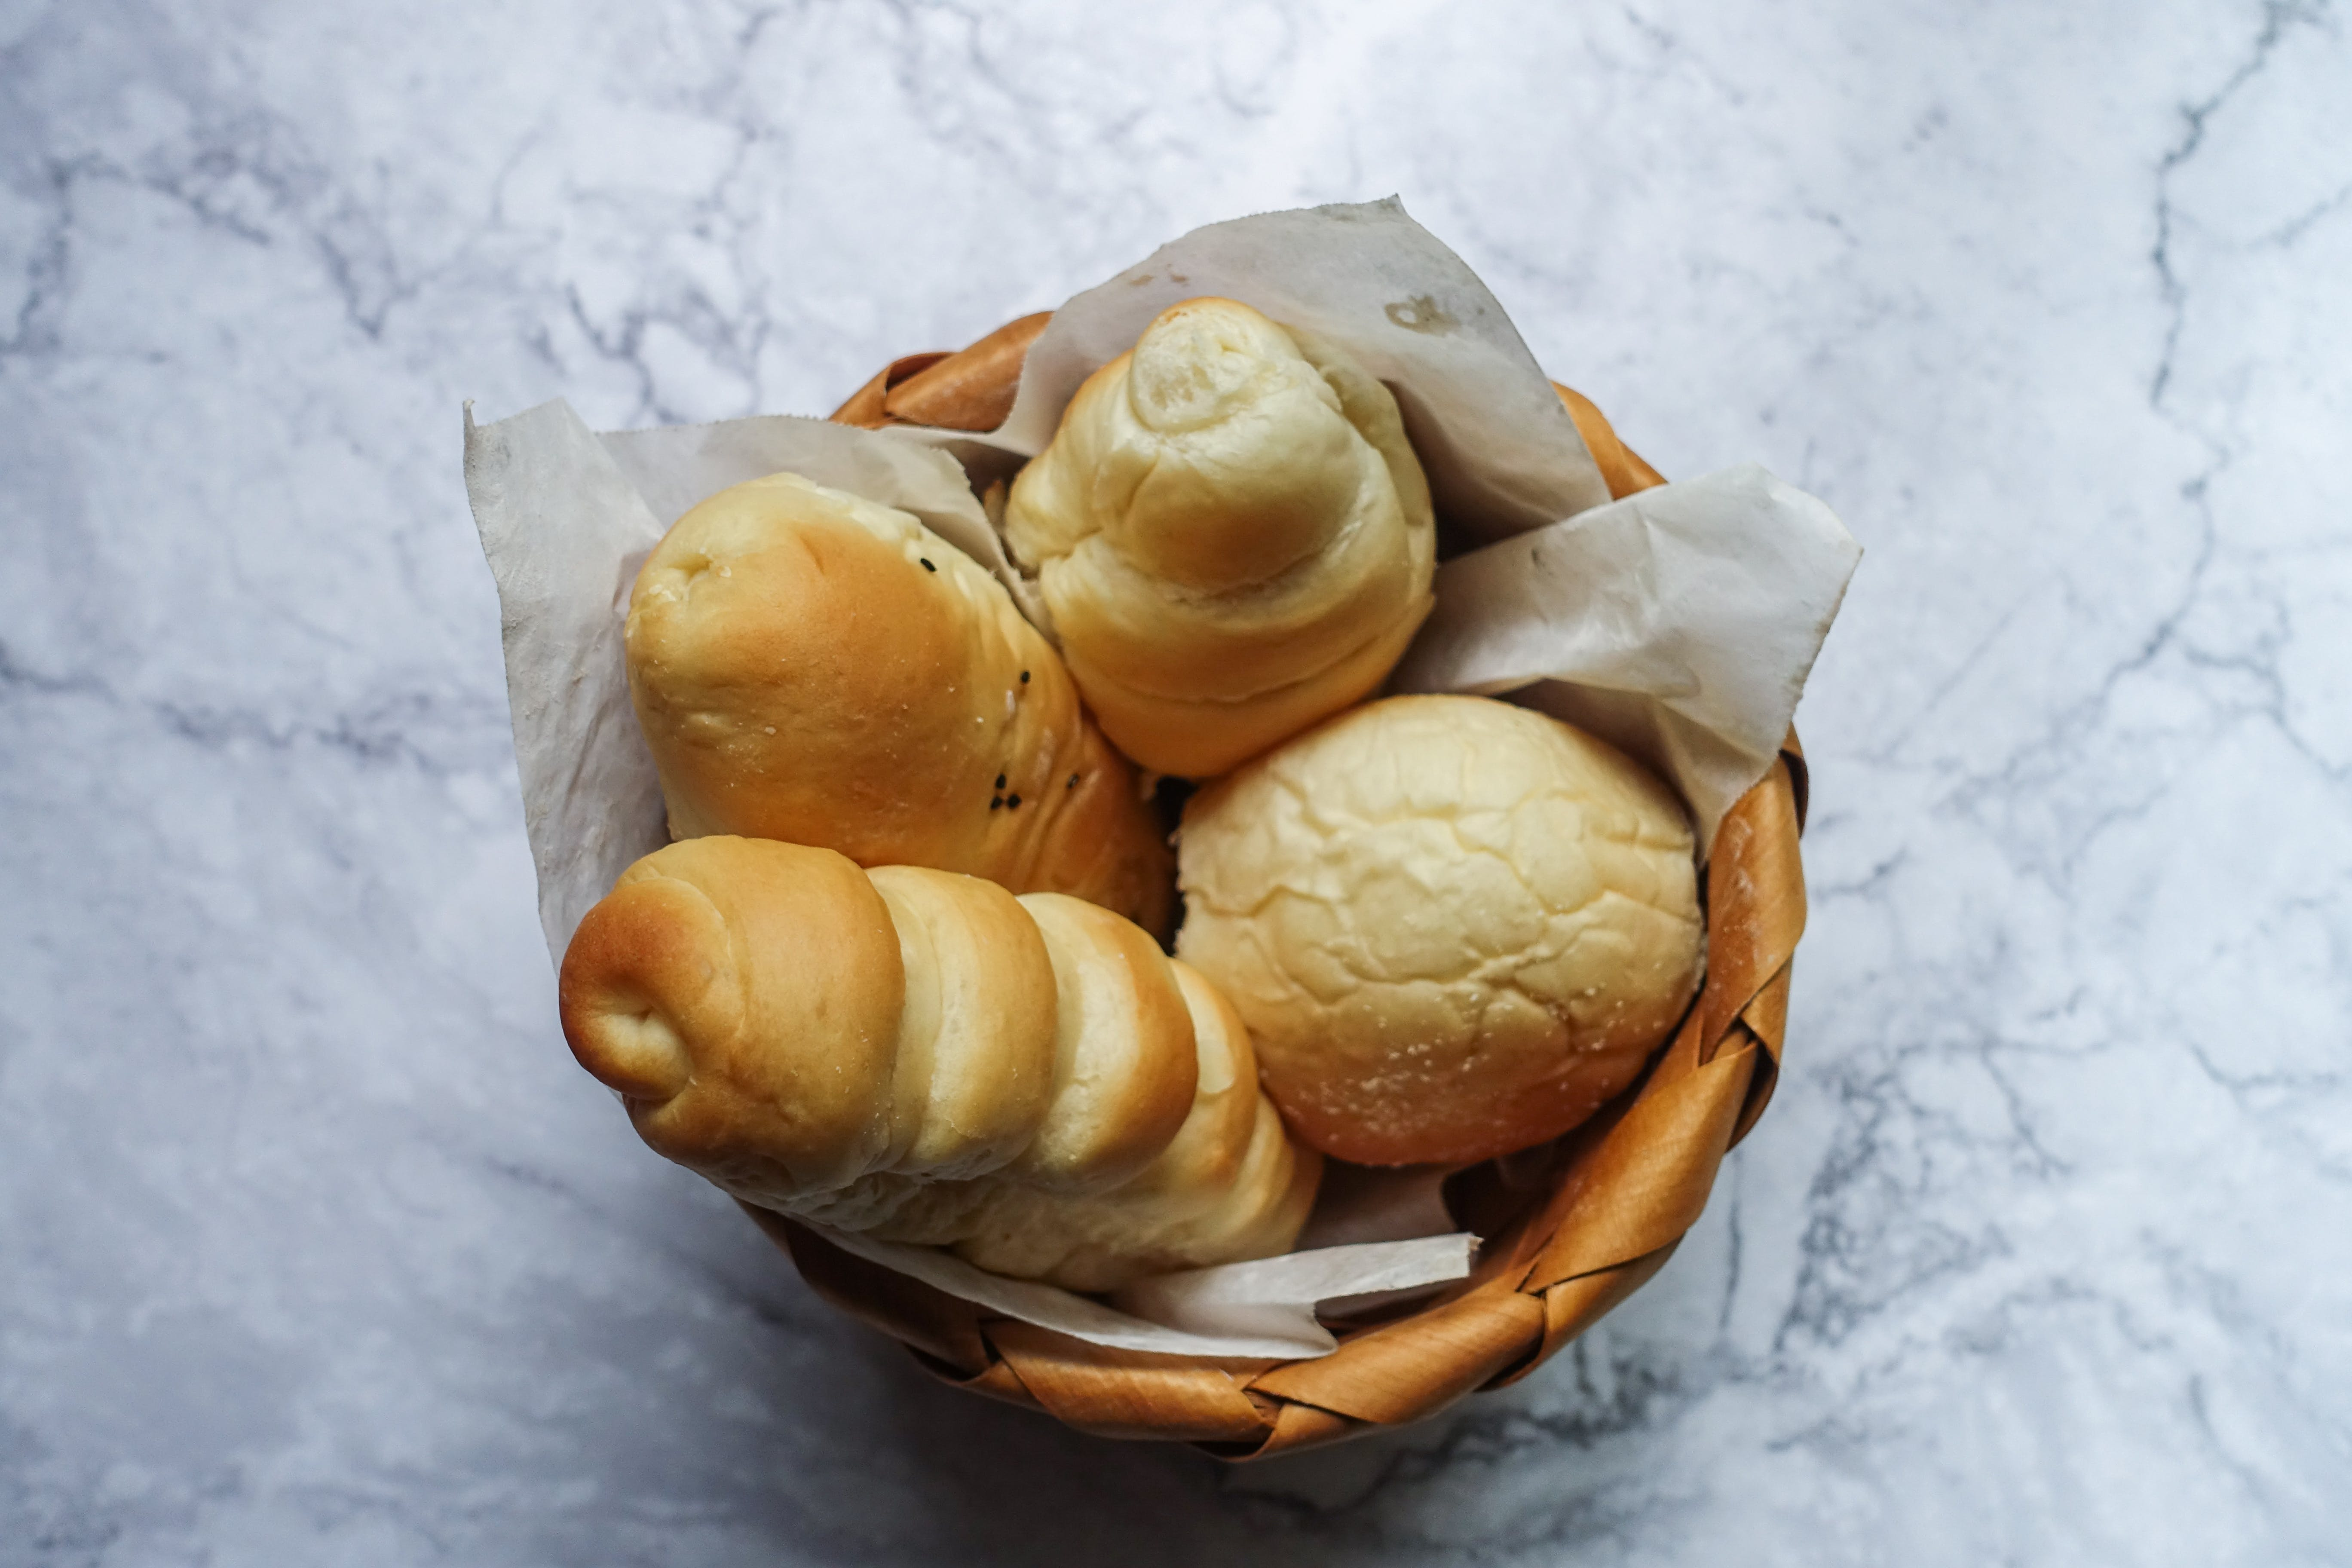 Fotos de stock gratuitas de hojaldre, horneado, pan